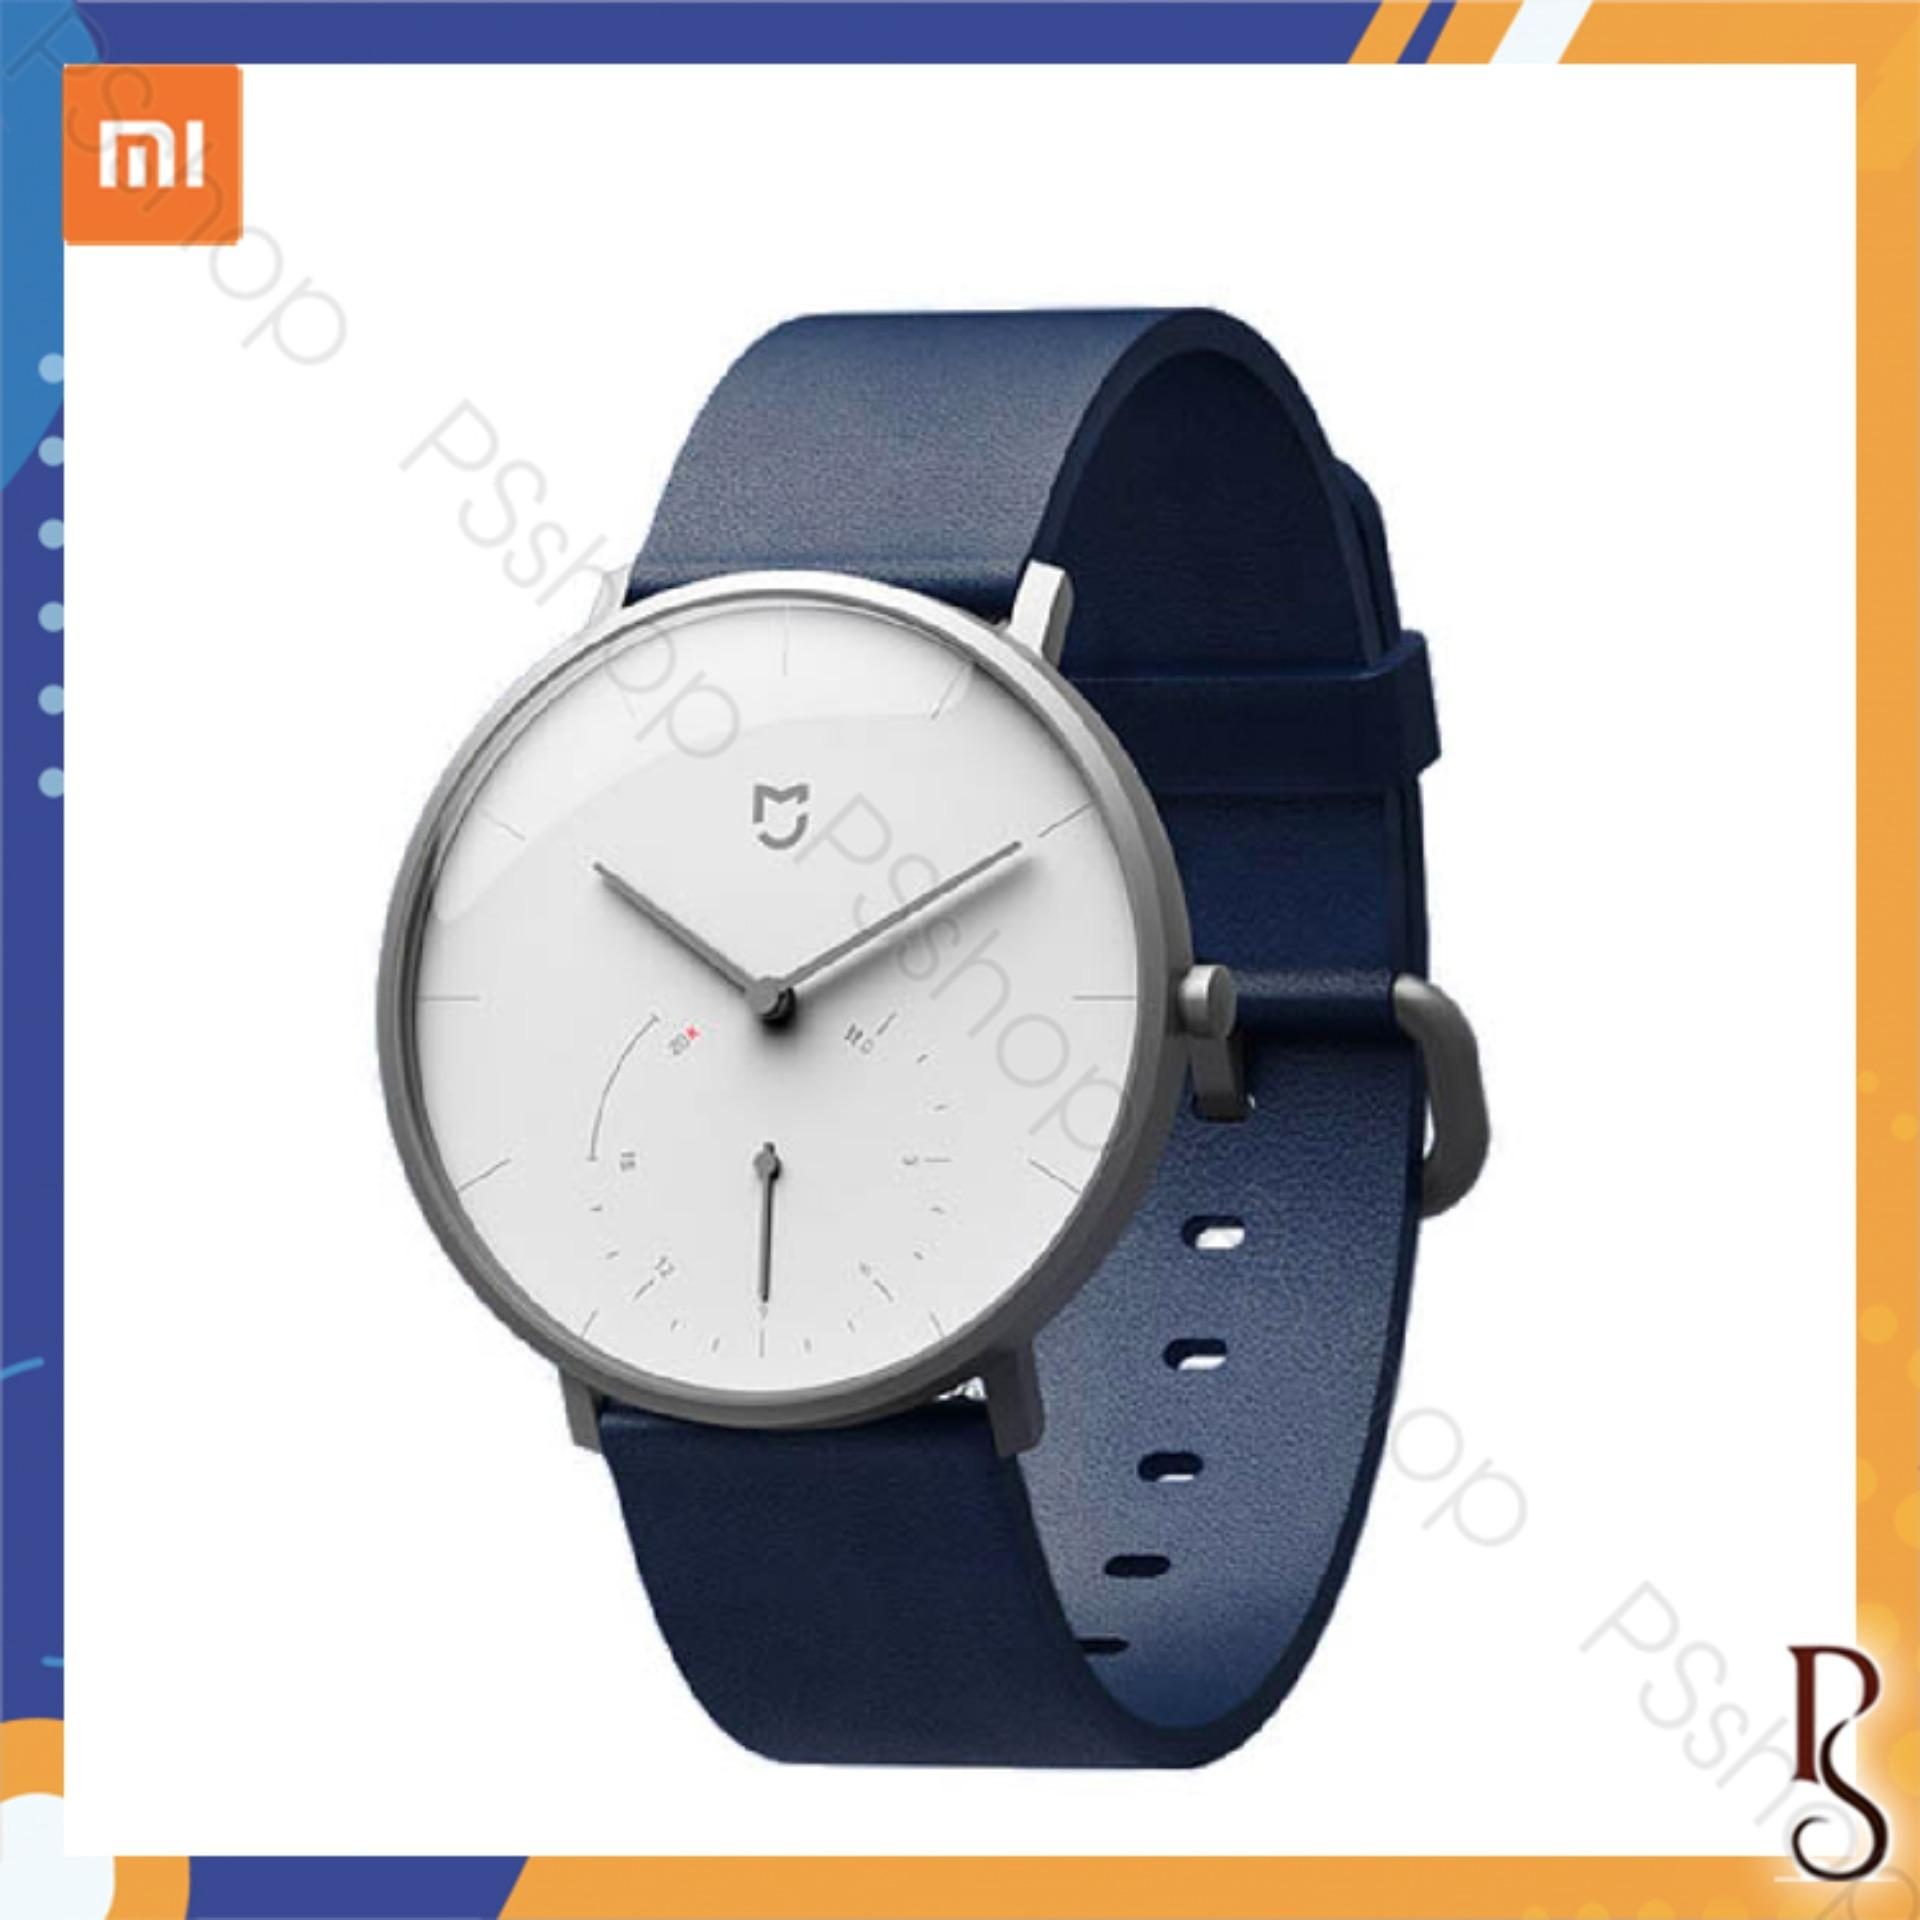 Đồng Hồ Thông Minh Xiaomi Mijia Quartz Smart Watch